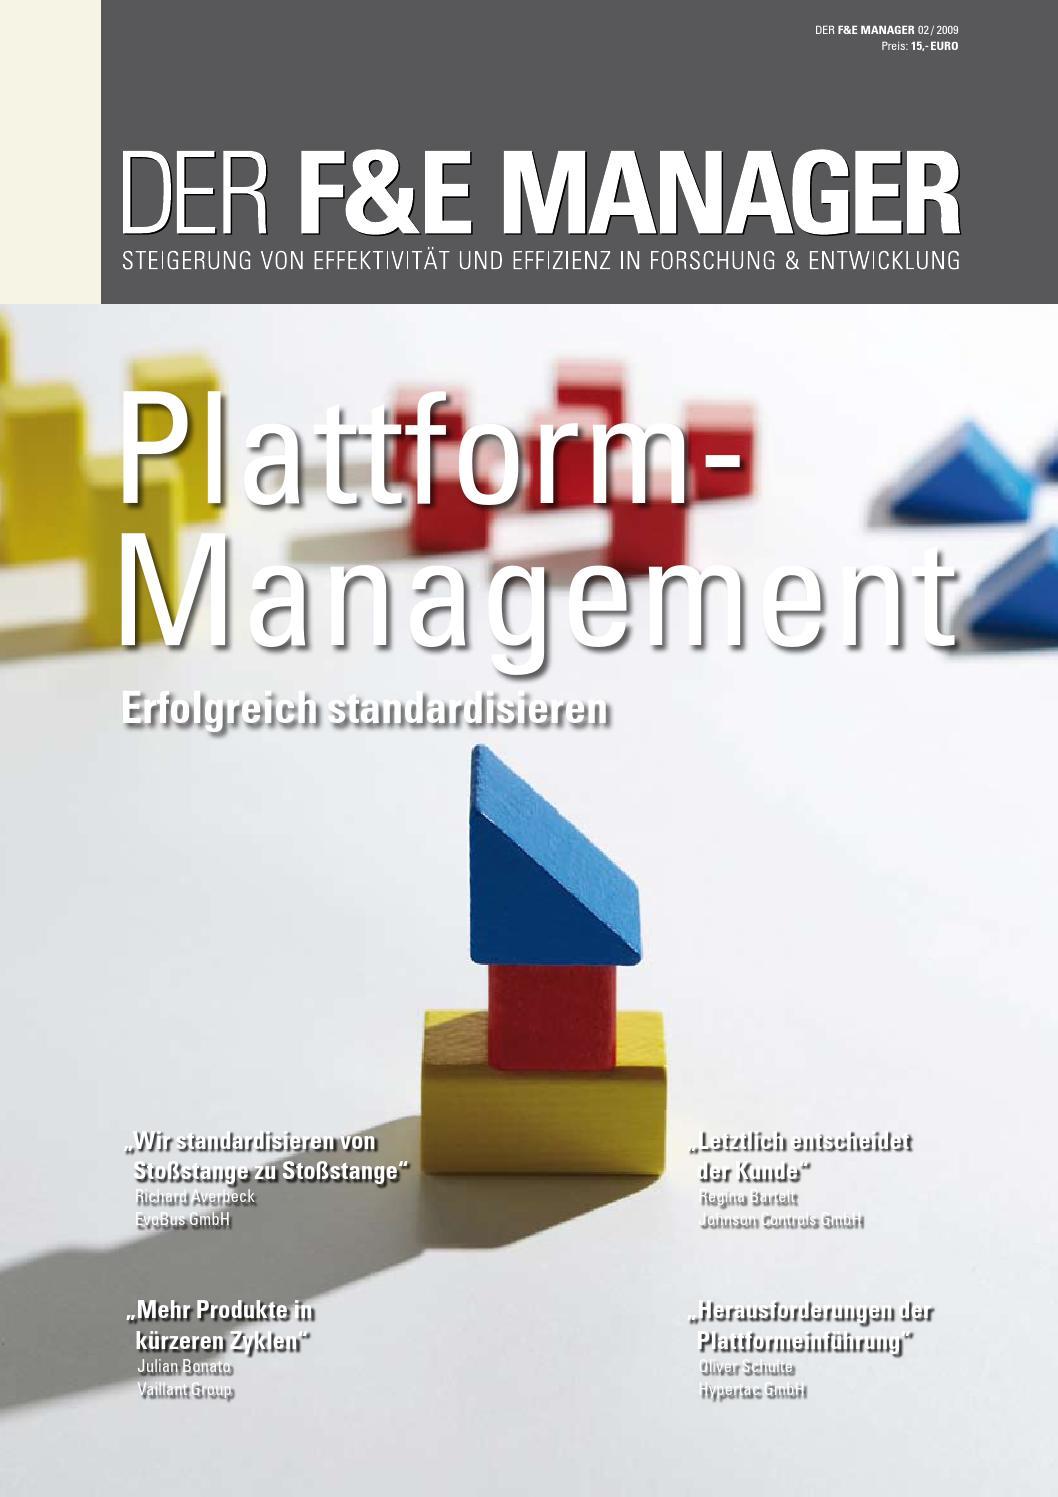 DER F&E MANAGER 02 2009 by AS&P Unternehmensberatung - issuu